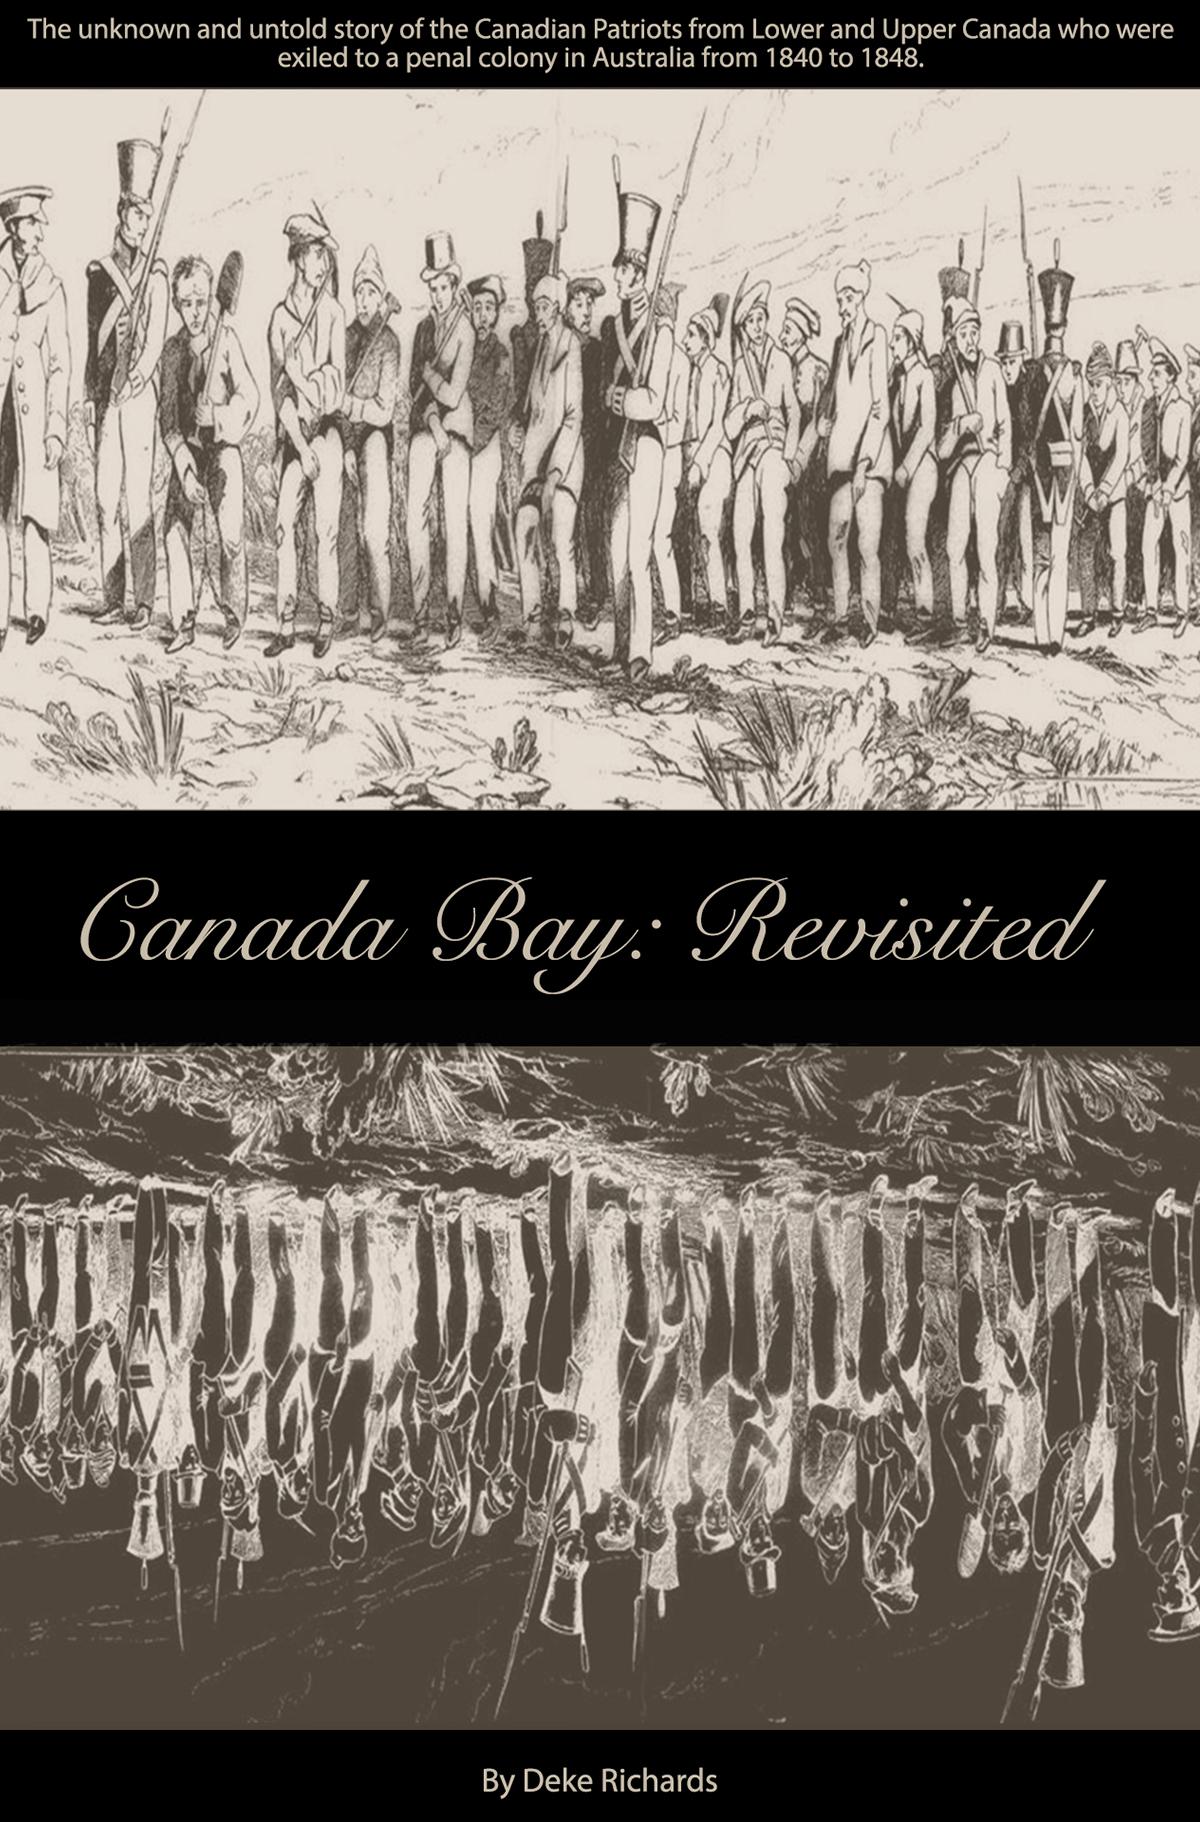 Canada-Bay-Poster-no-logo.jpg